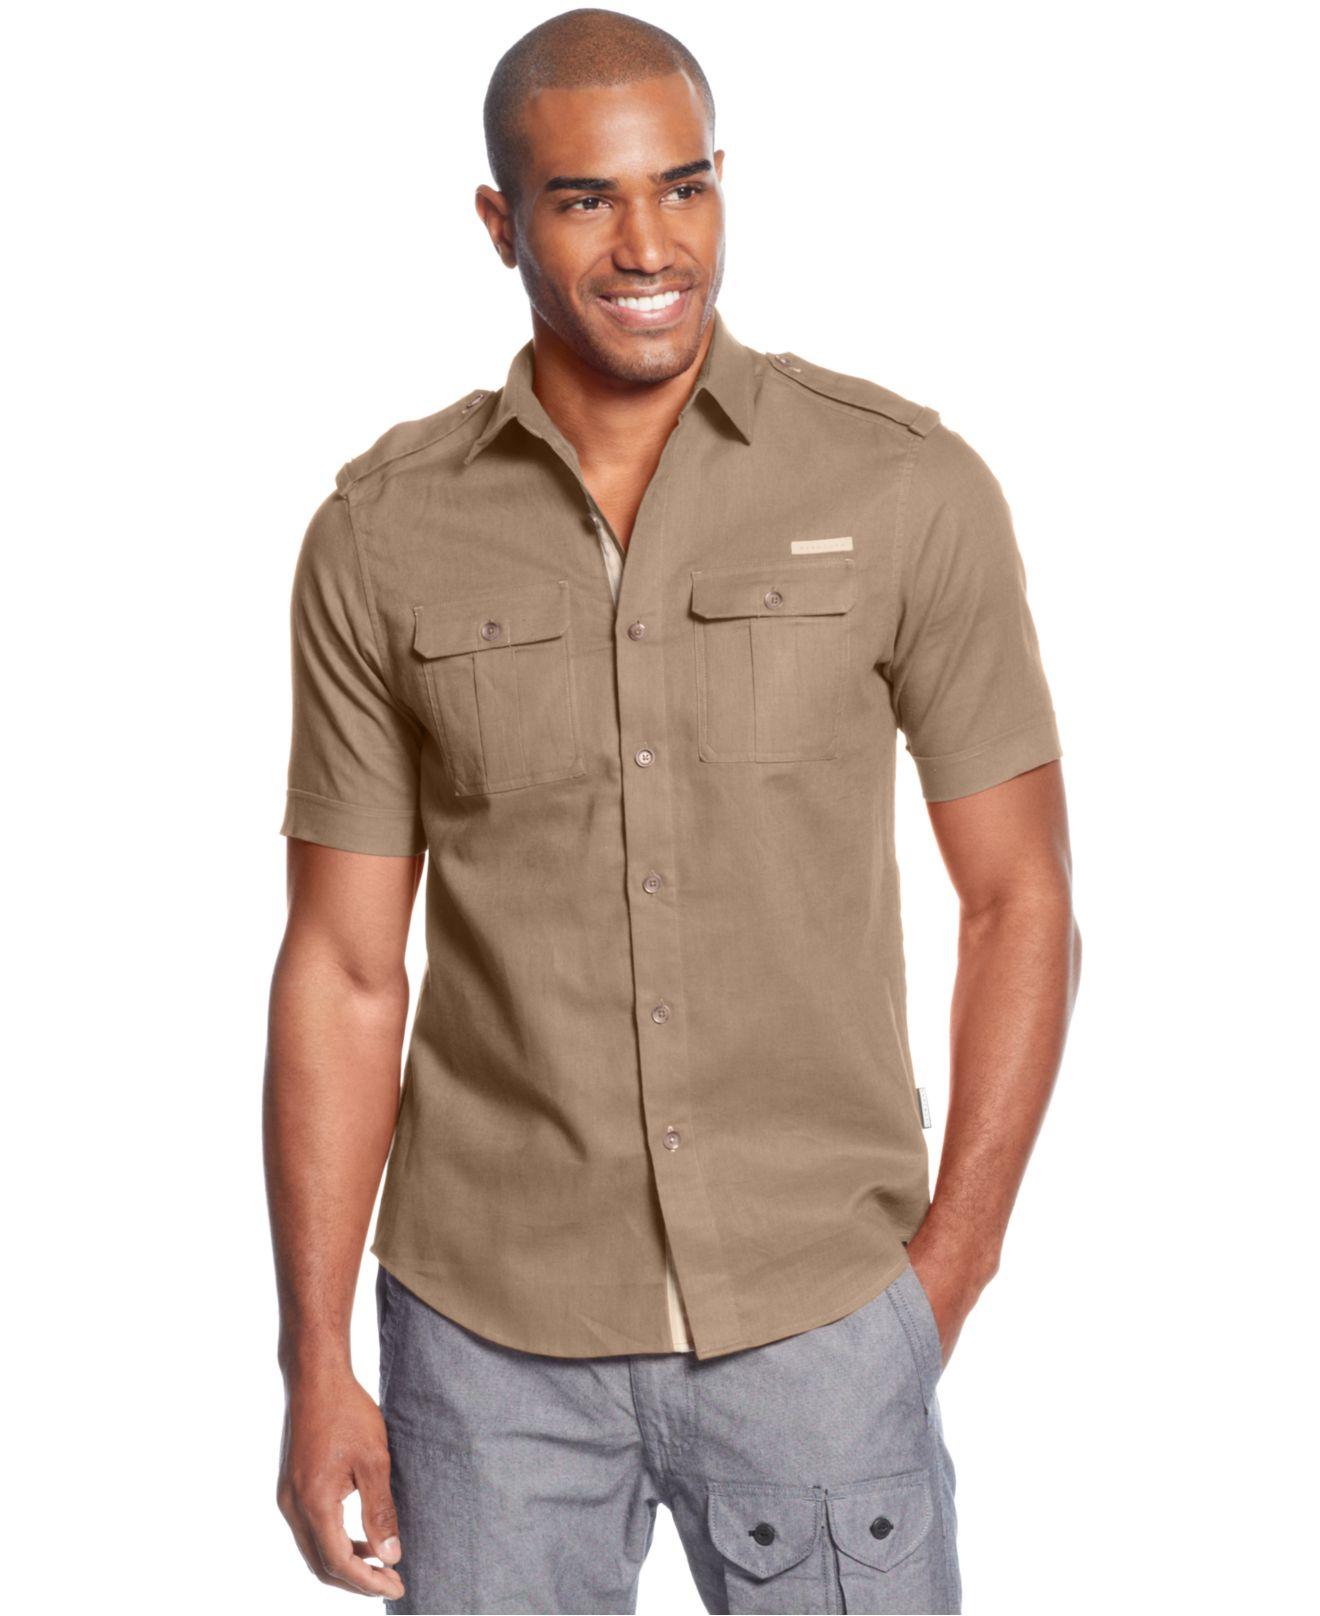 Lyst sean john short sleeve linen blend shirt in natural for Sean john t shirts for mens